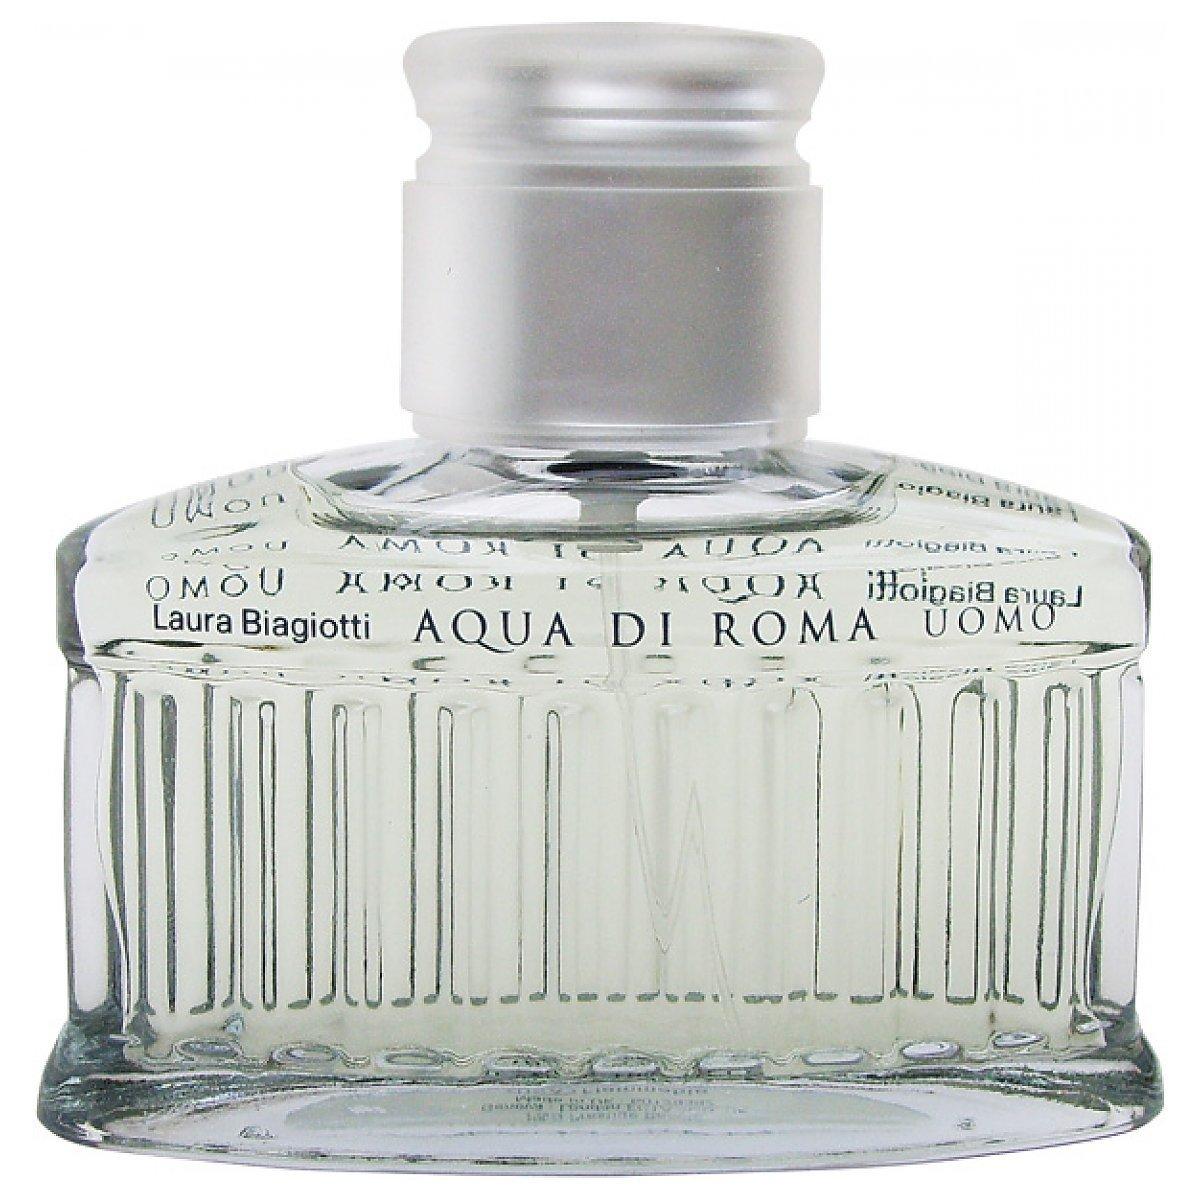 Laura 125ml Toaletowa Roma Biagiotti Aqua Di Uomo Spray Woda wOPX8n0k